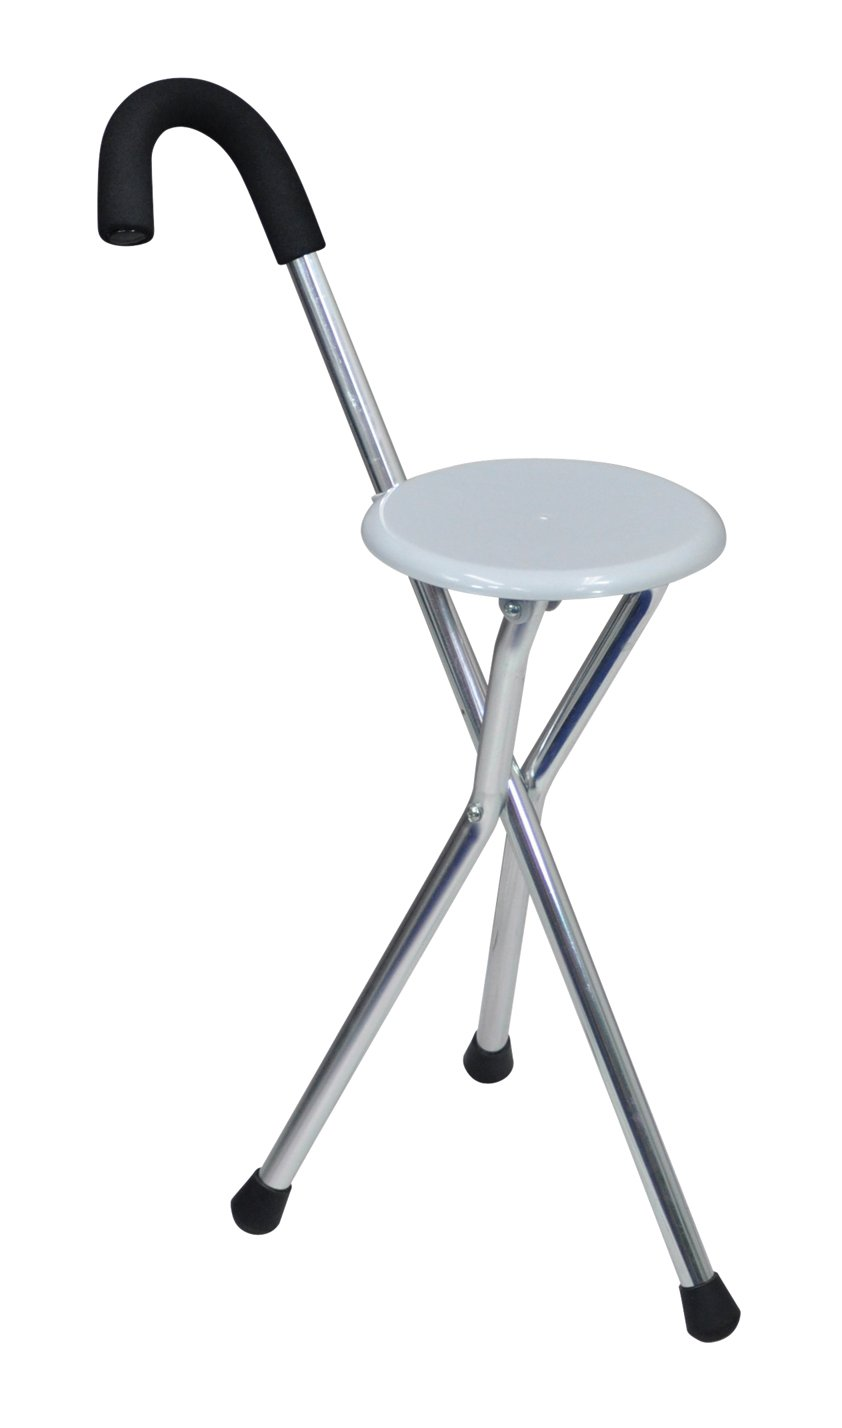 Attirant Amazon.com : Aidapt VP159A Disability Medical Aid Folding Seat Cane (Walking  Stick U0026 Chair Seat) : Beauty